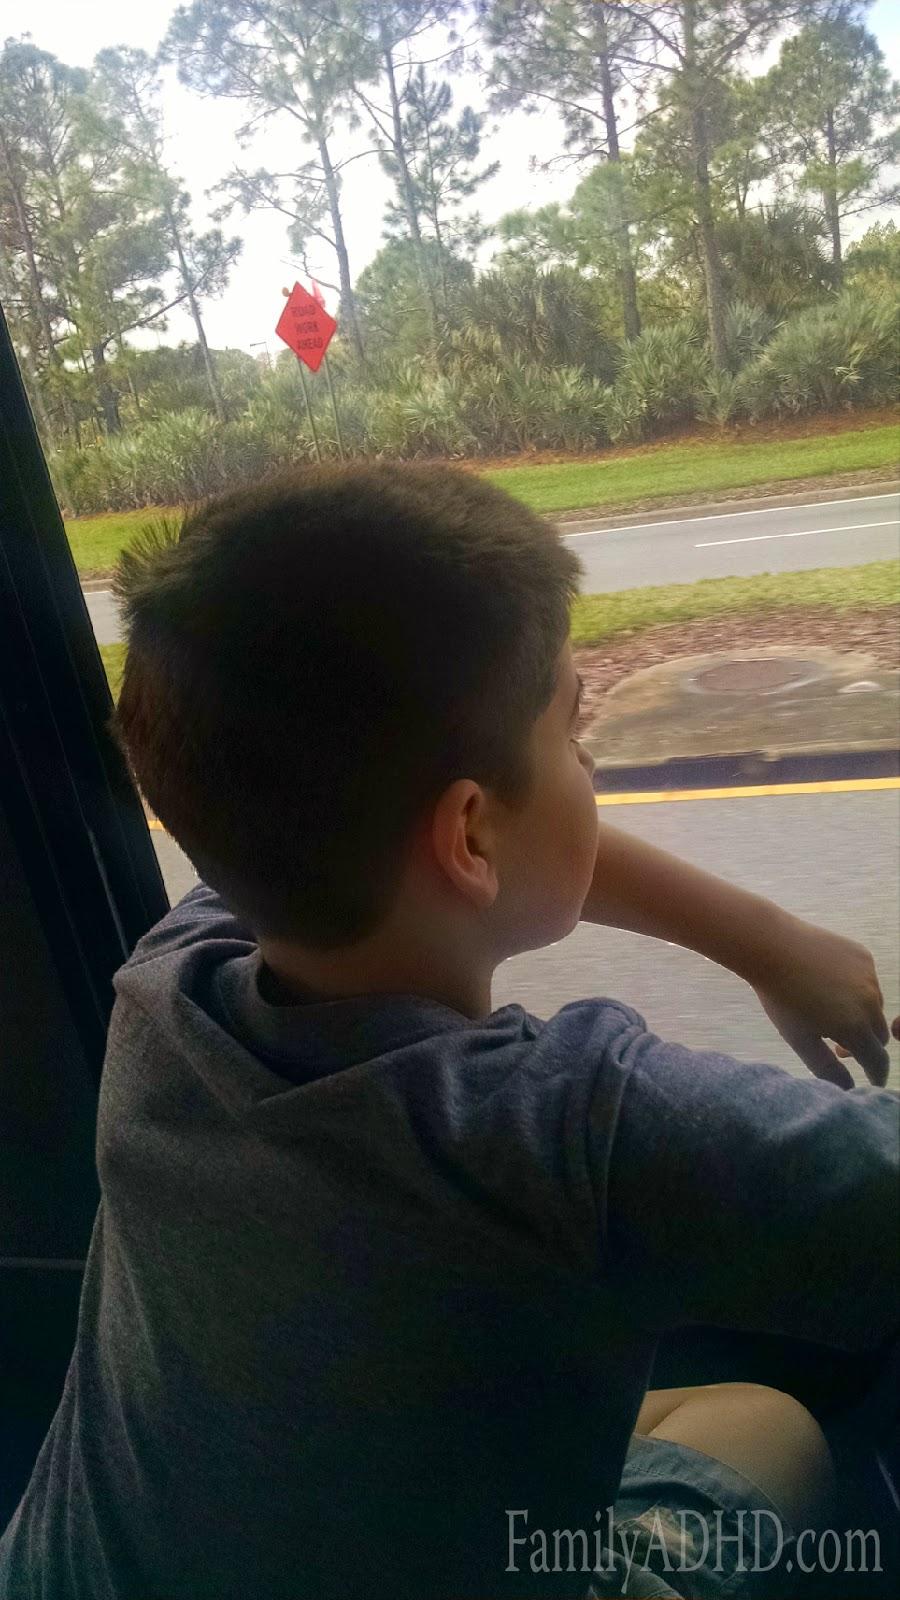 orlando family travel downtown disney special needs review